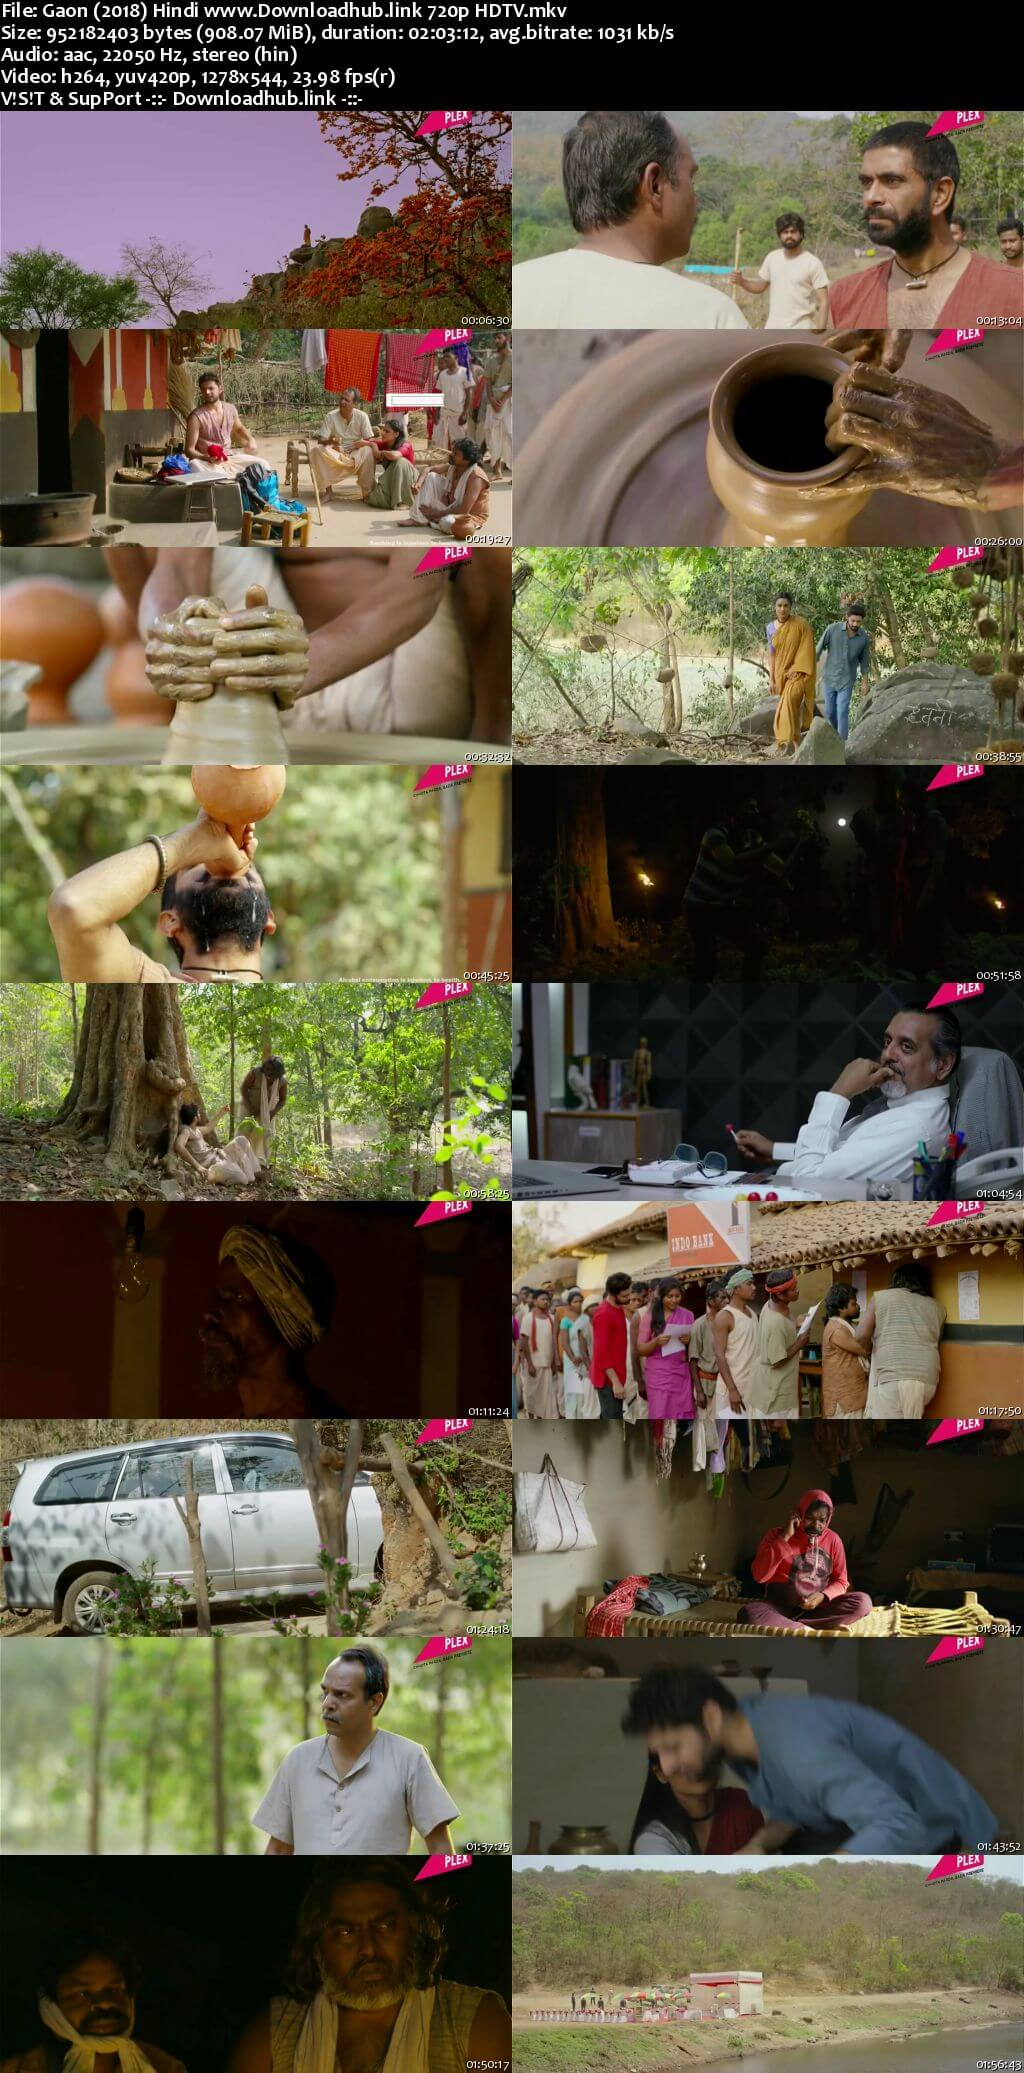 Gaon 2018 Hindi 720p HDTV x264